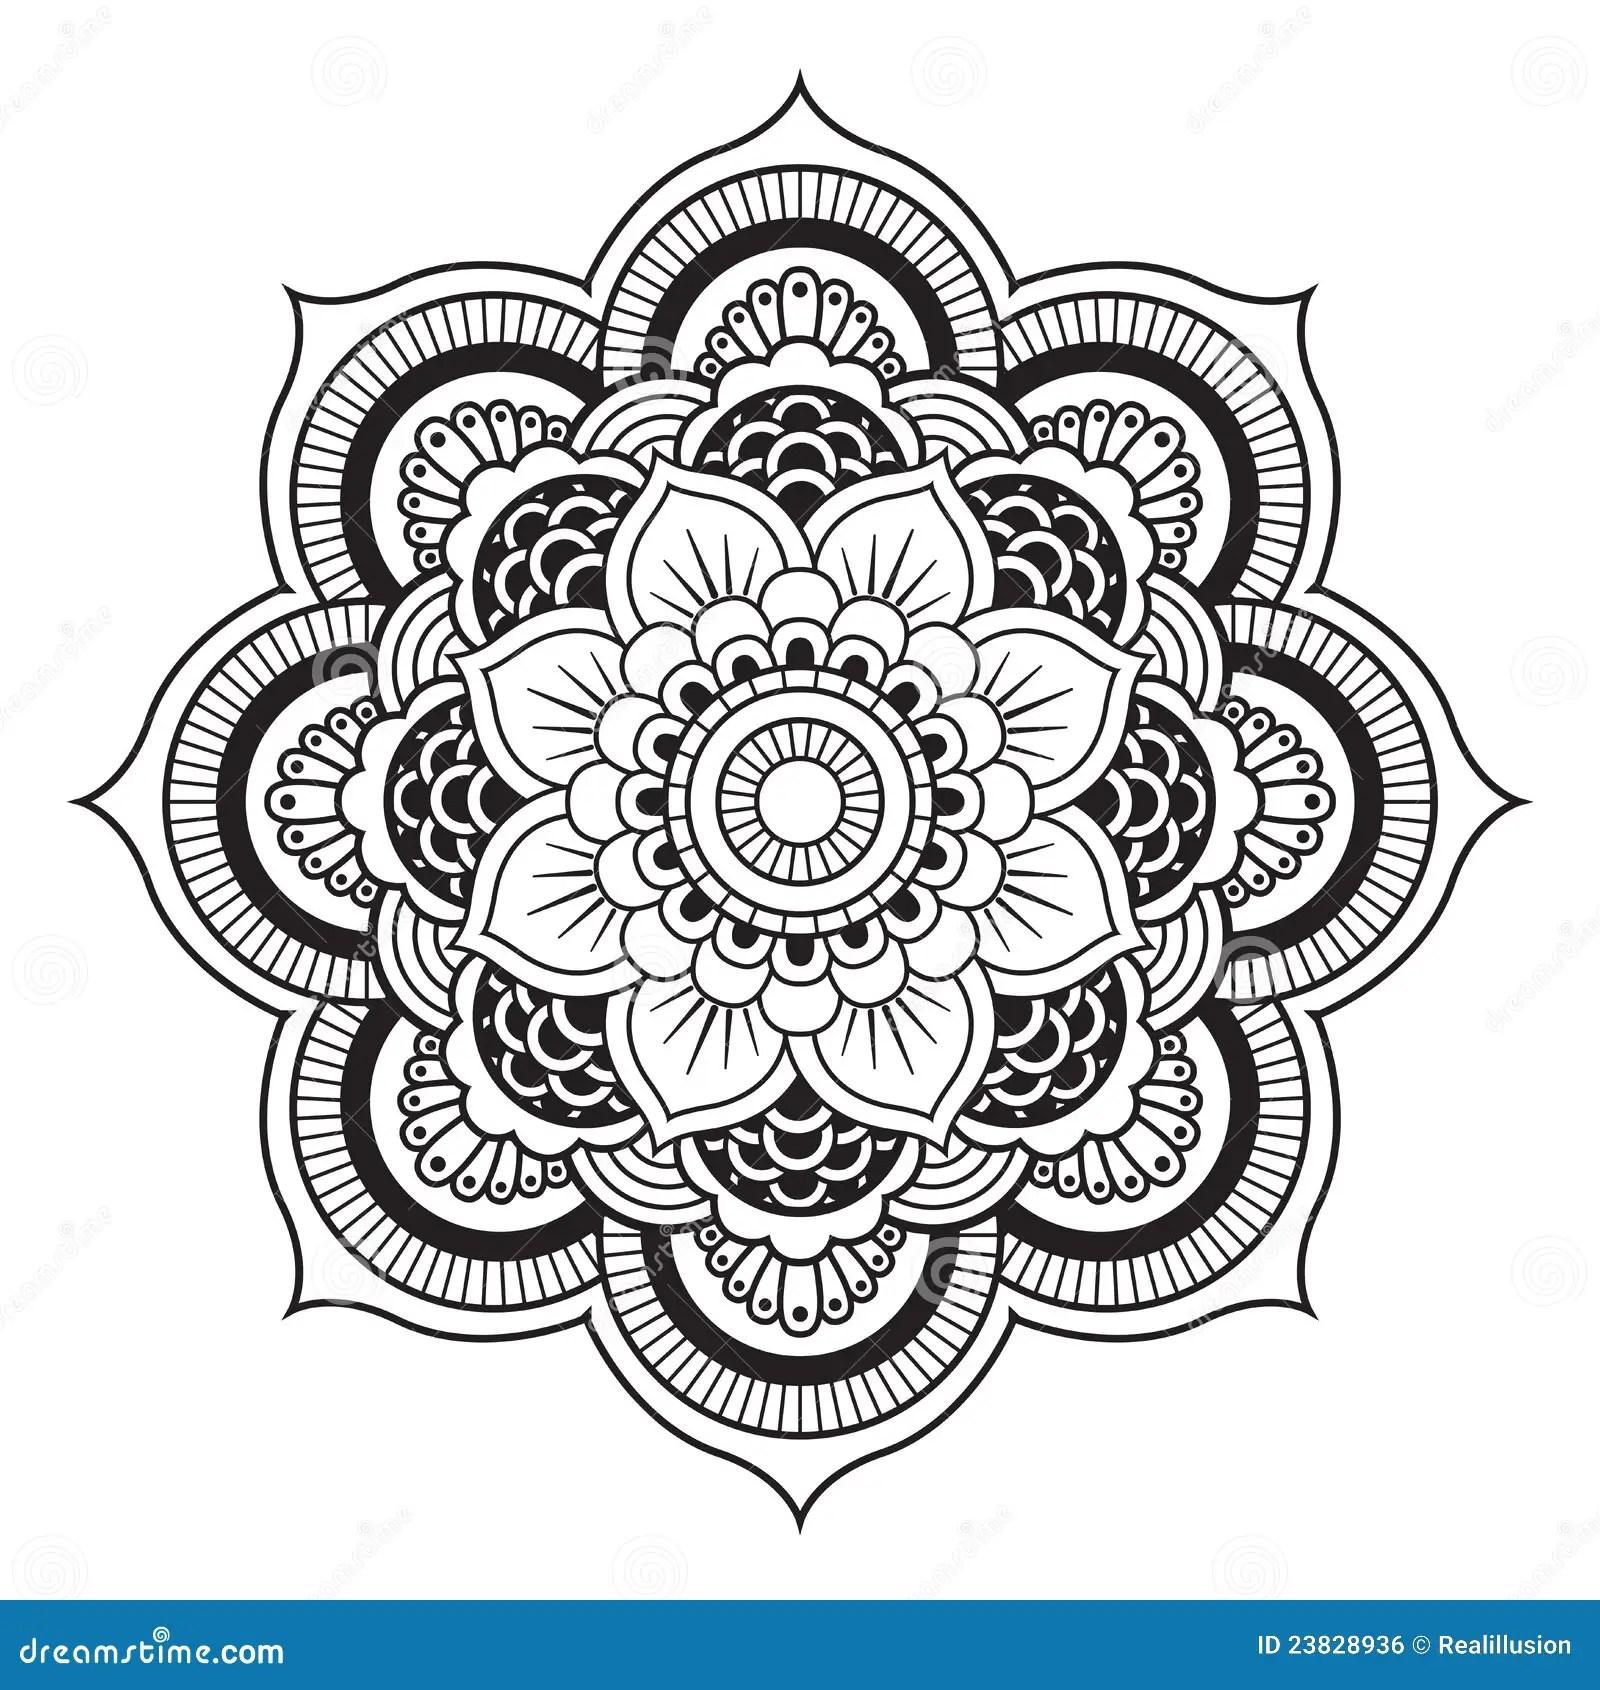 Mandala Vektor Abbildung Illustration Von In N